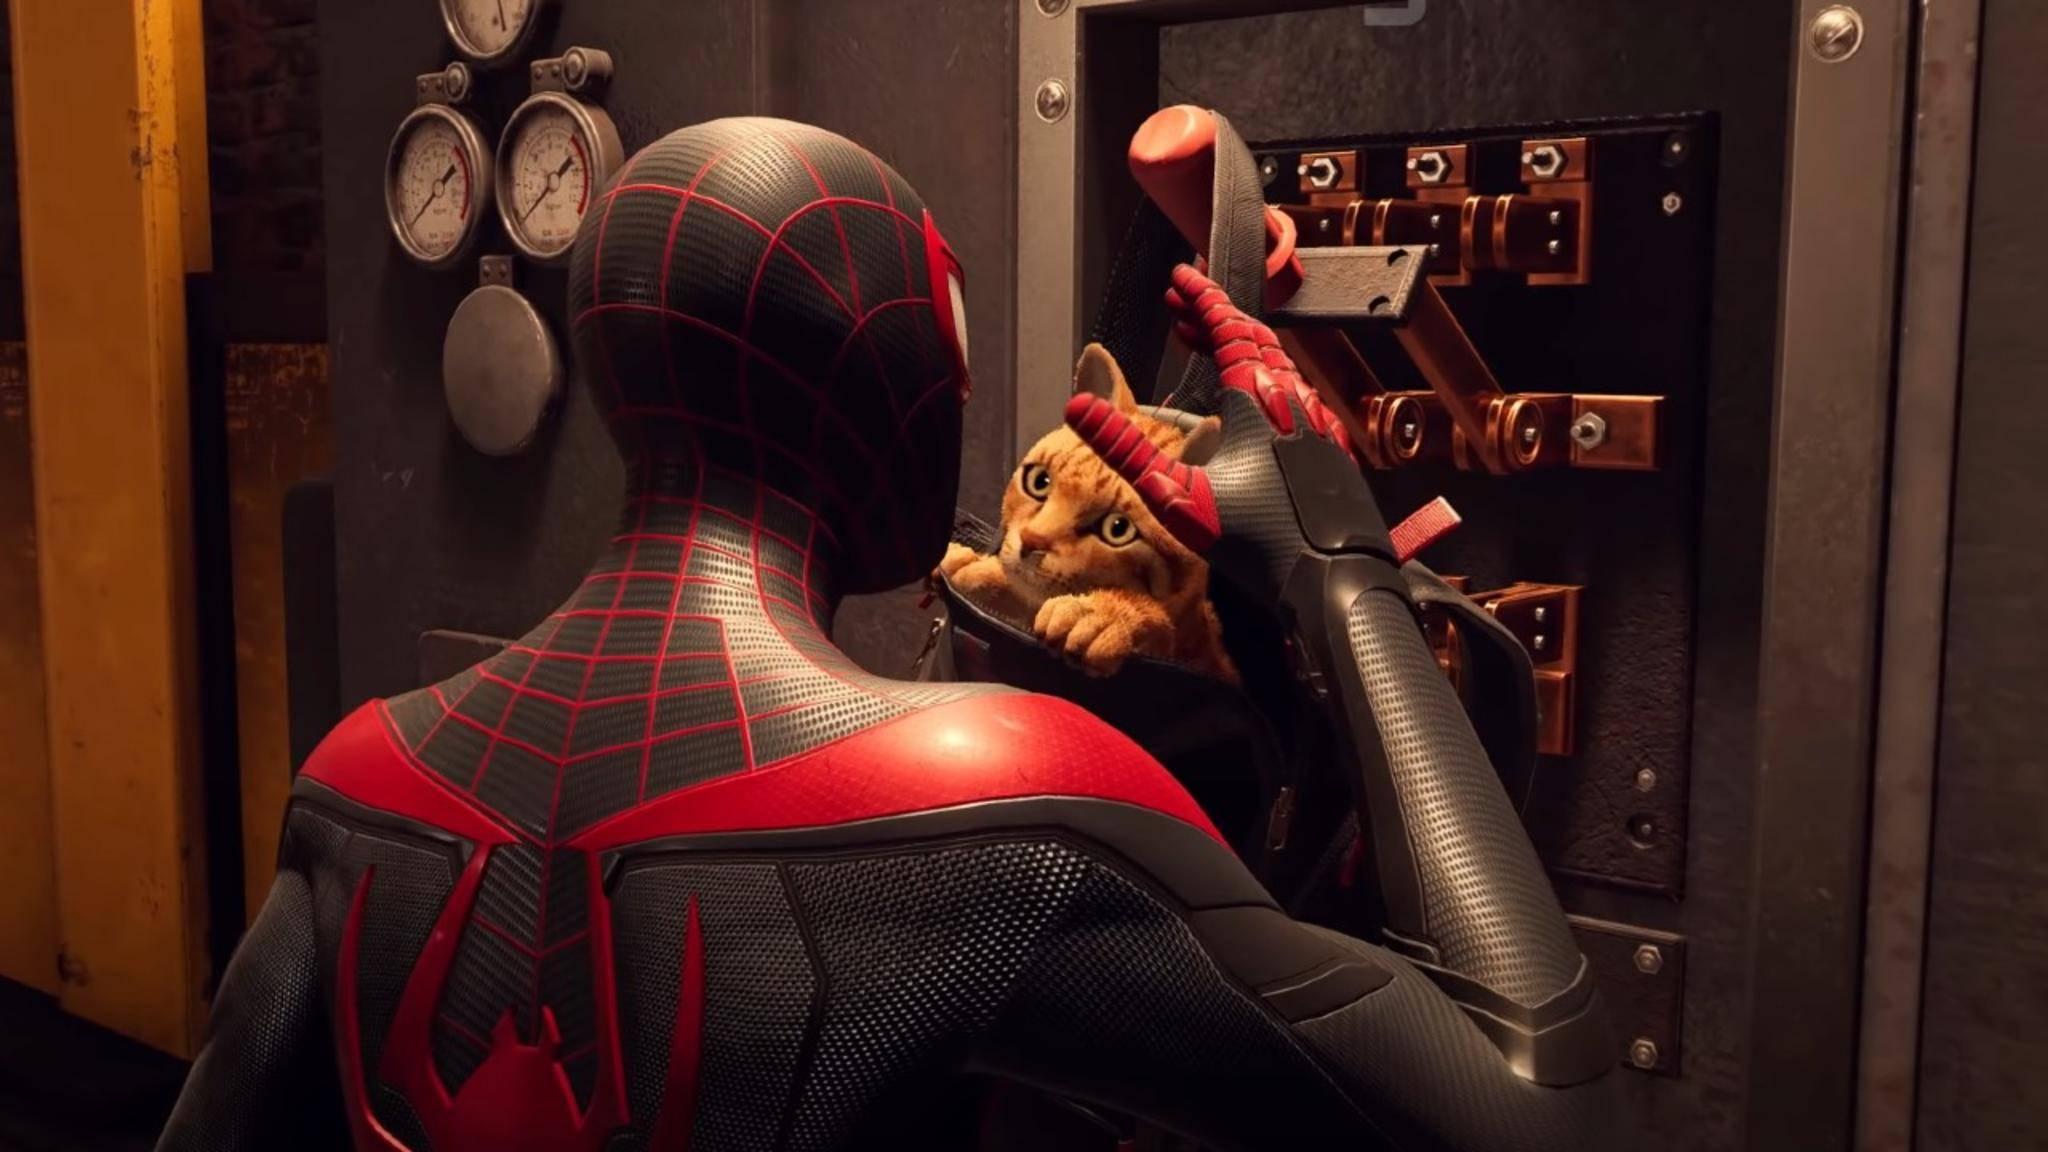 spider-man-miles-morales-katze-screenshot